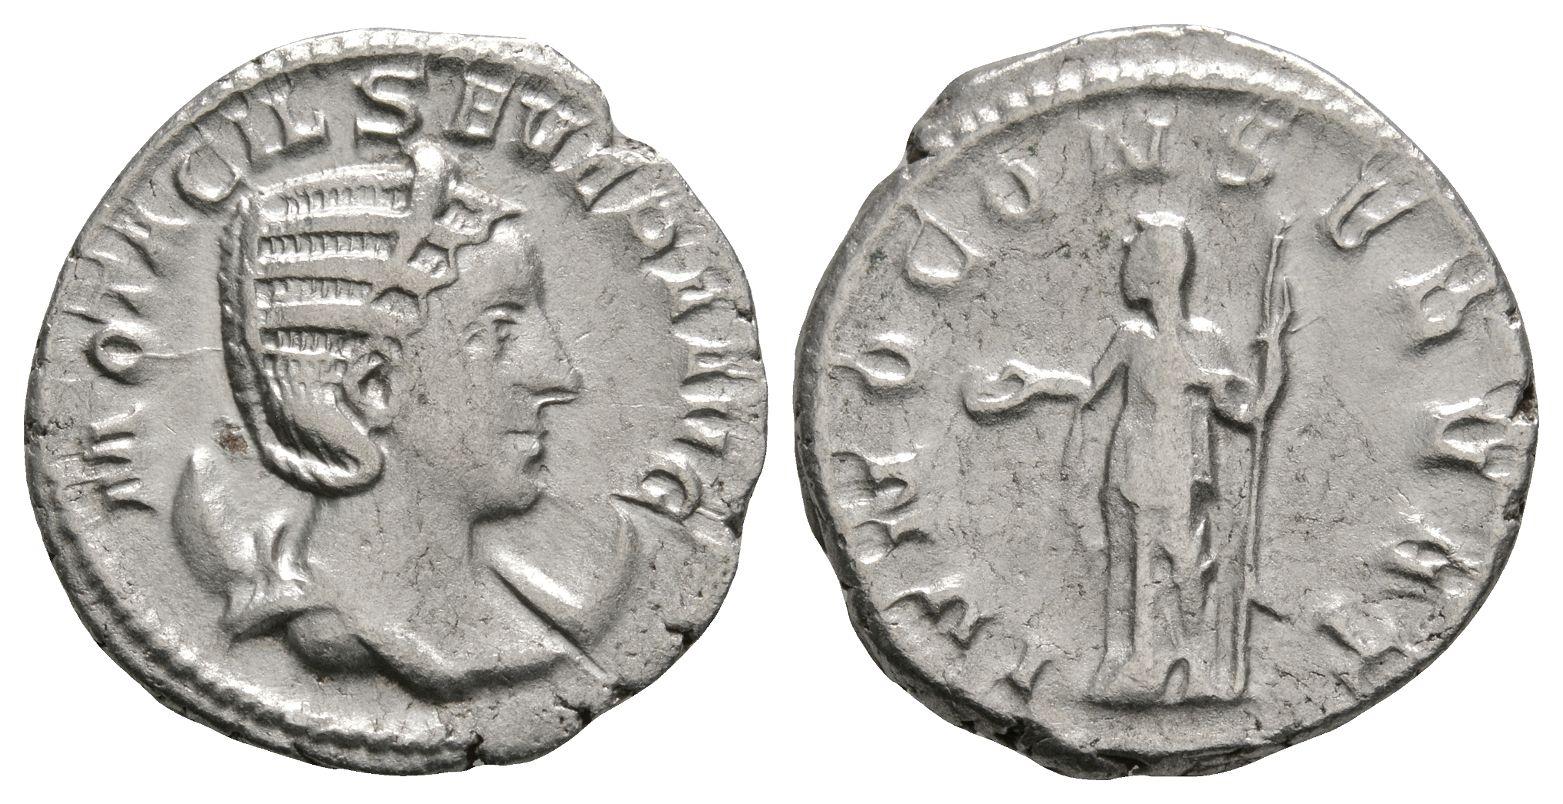 Roman Imperial Coins - Otacilia Severa - Juno Antoninianus